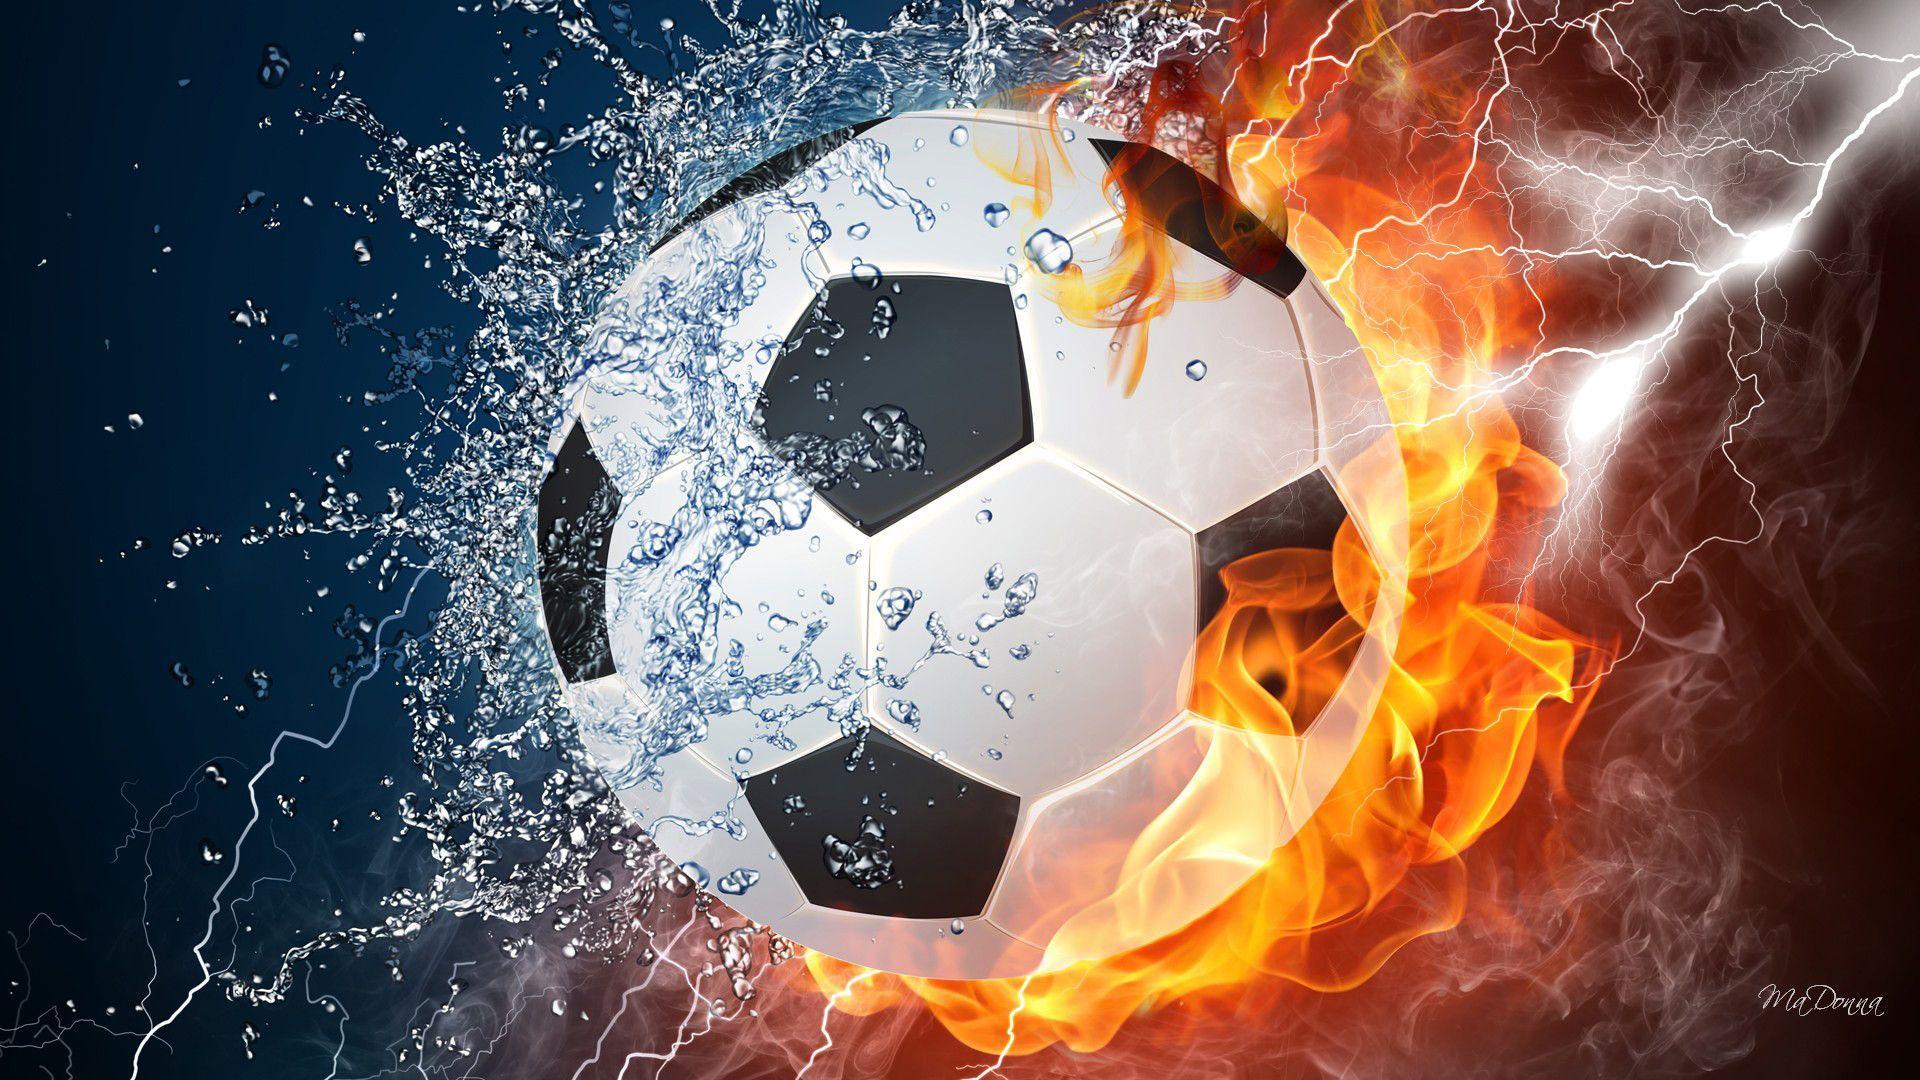 Cool Fire Backgrounds Wallpaper Cave Soccer Balls Soccer Ball Soccer